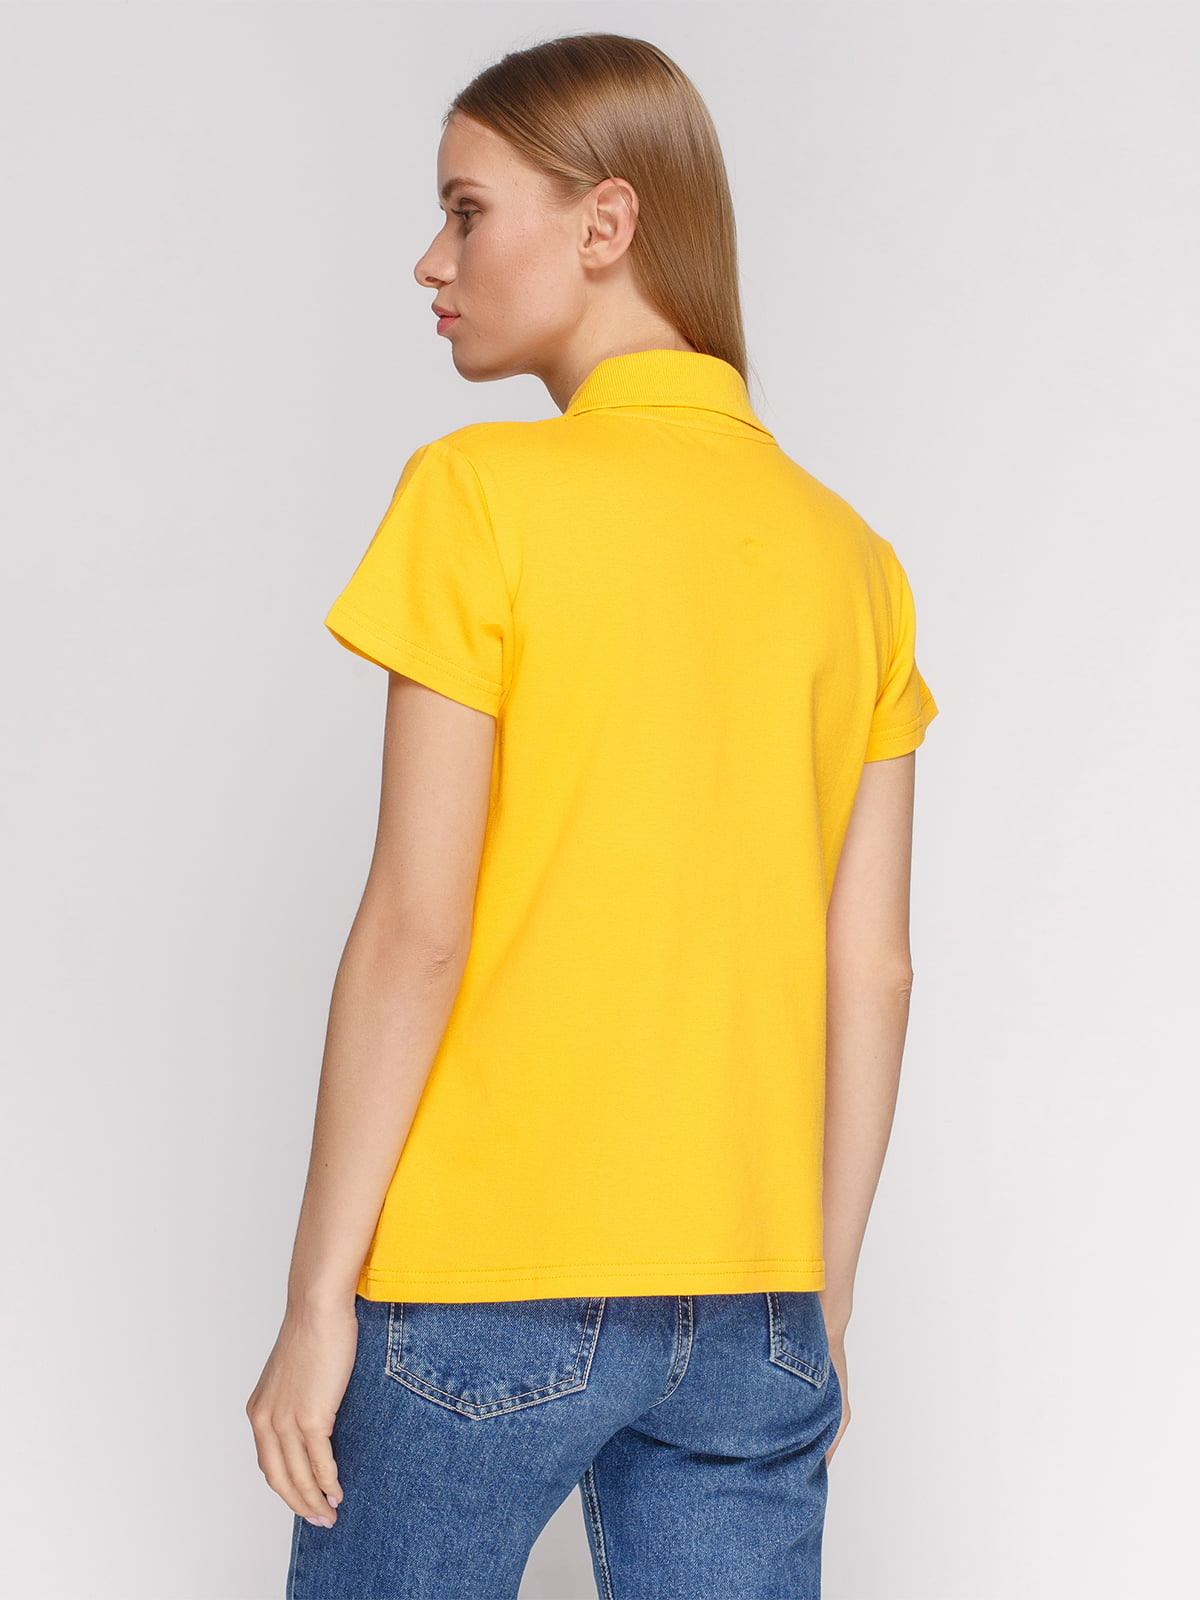 Футболка-поло жовта з принтом | 4578611 | фото 2